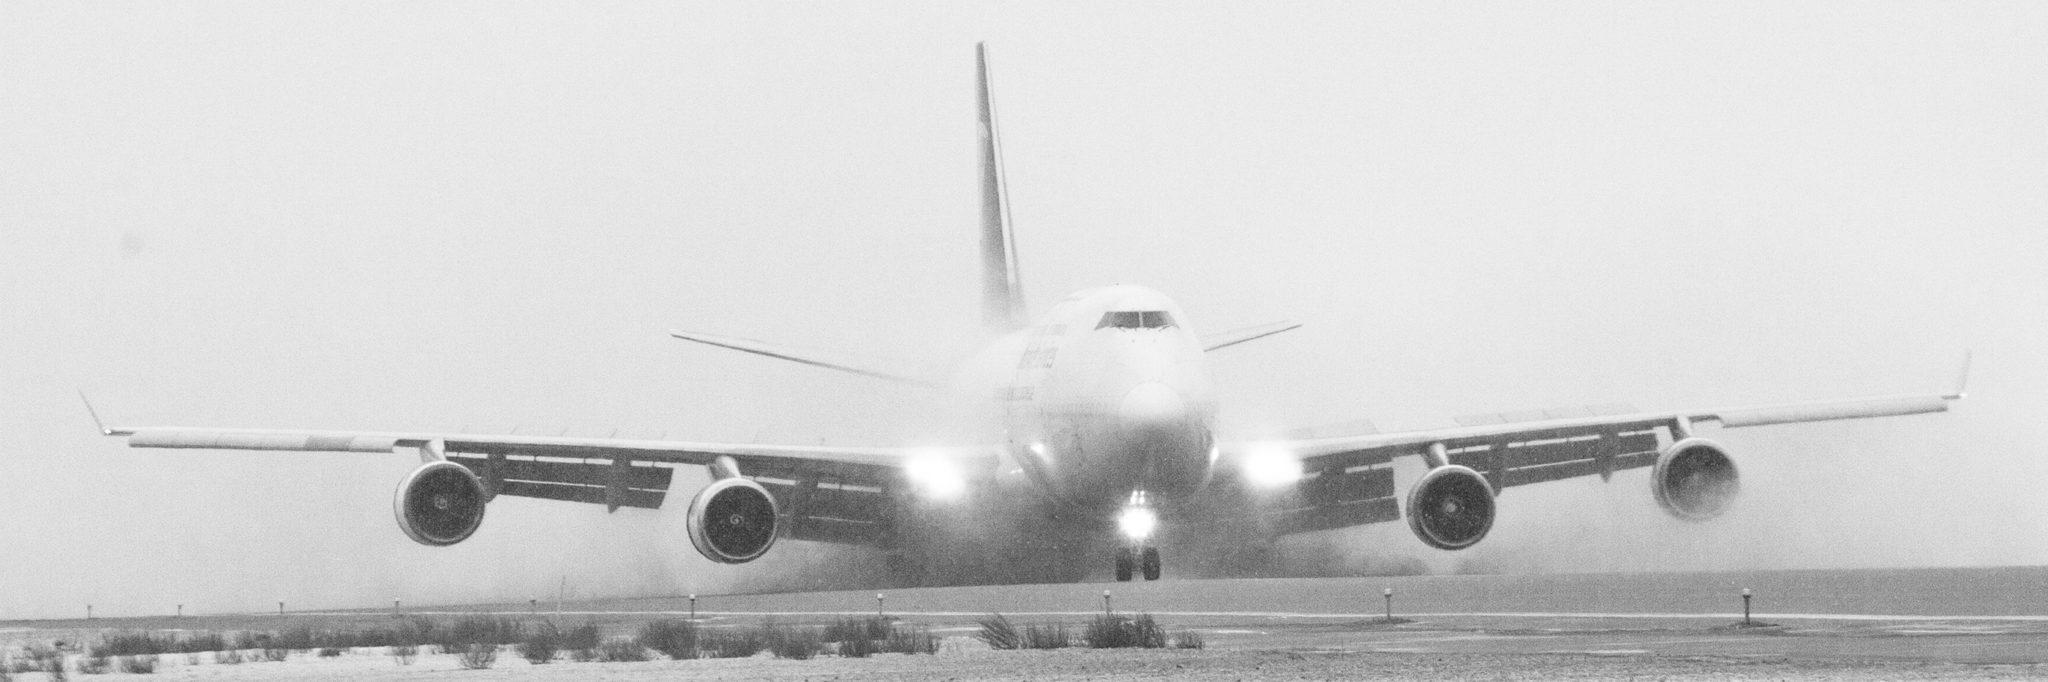 Alaskafoto photo of a jet landing